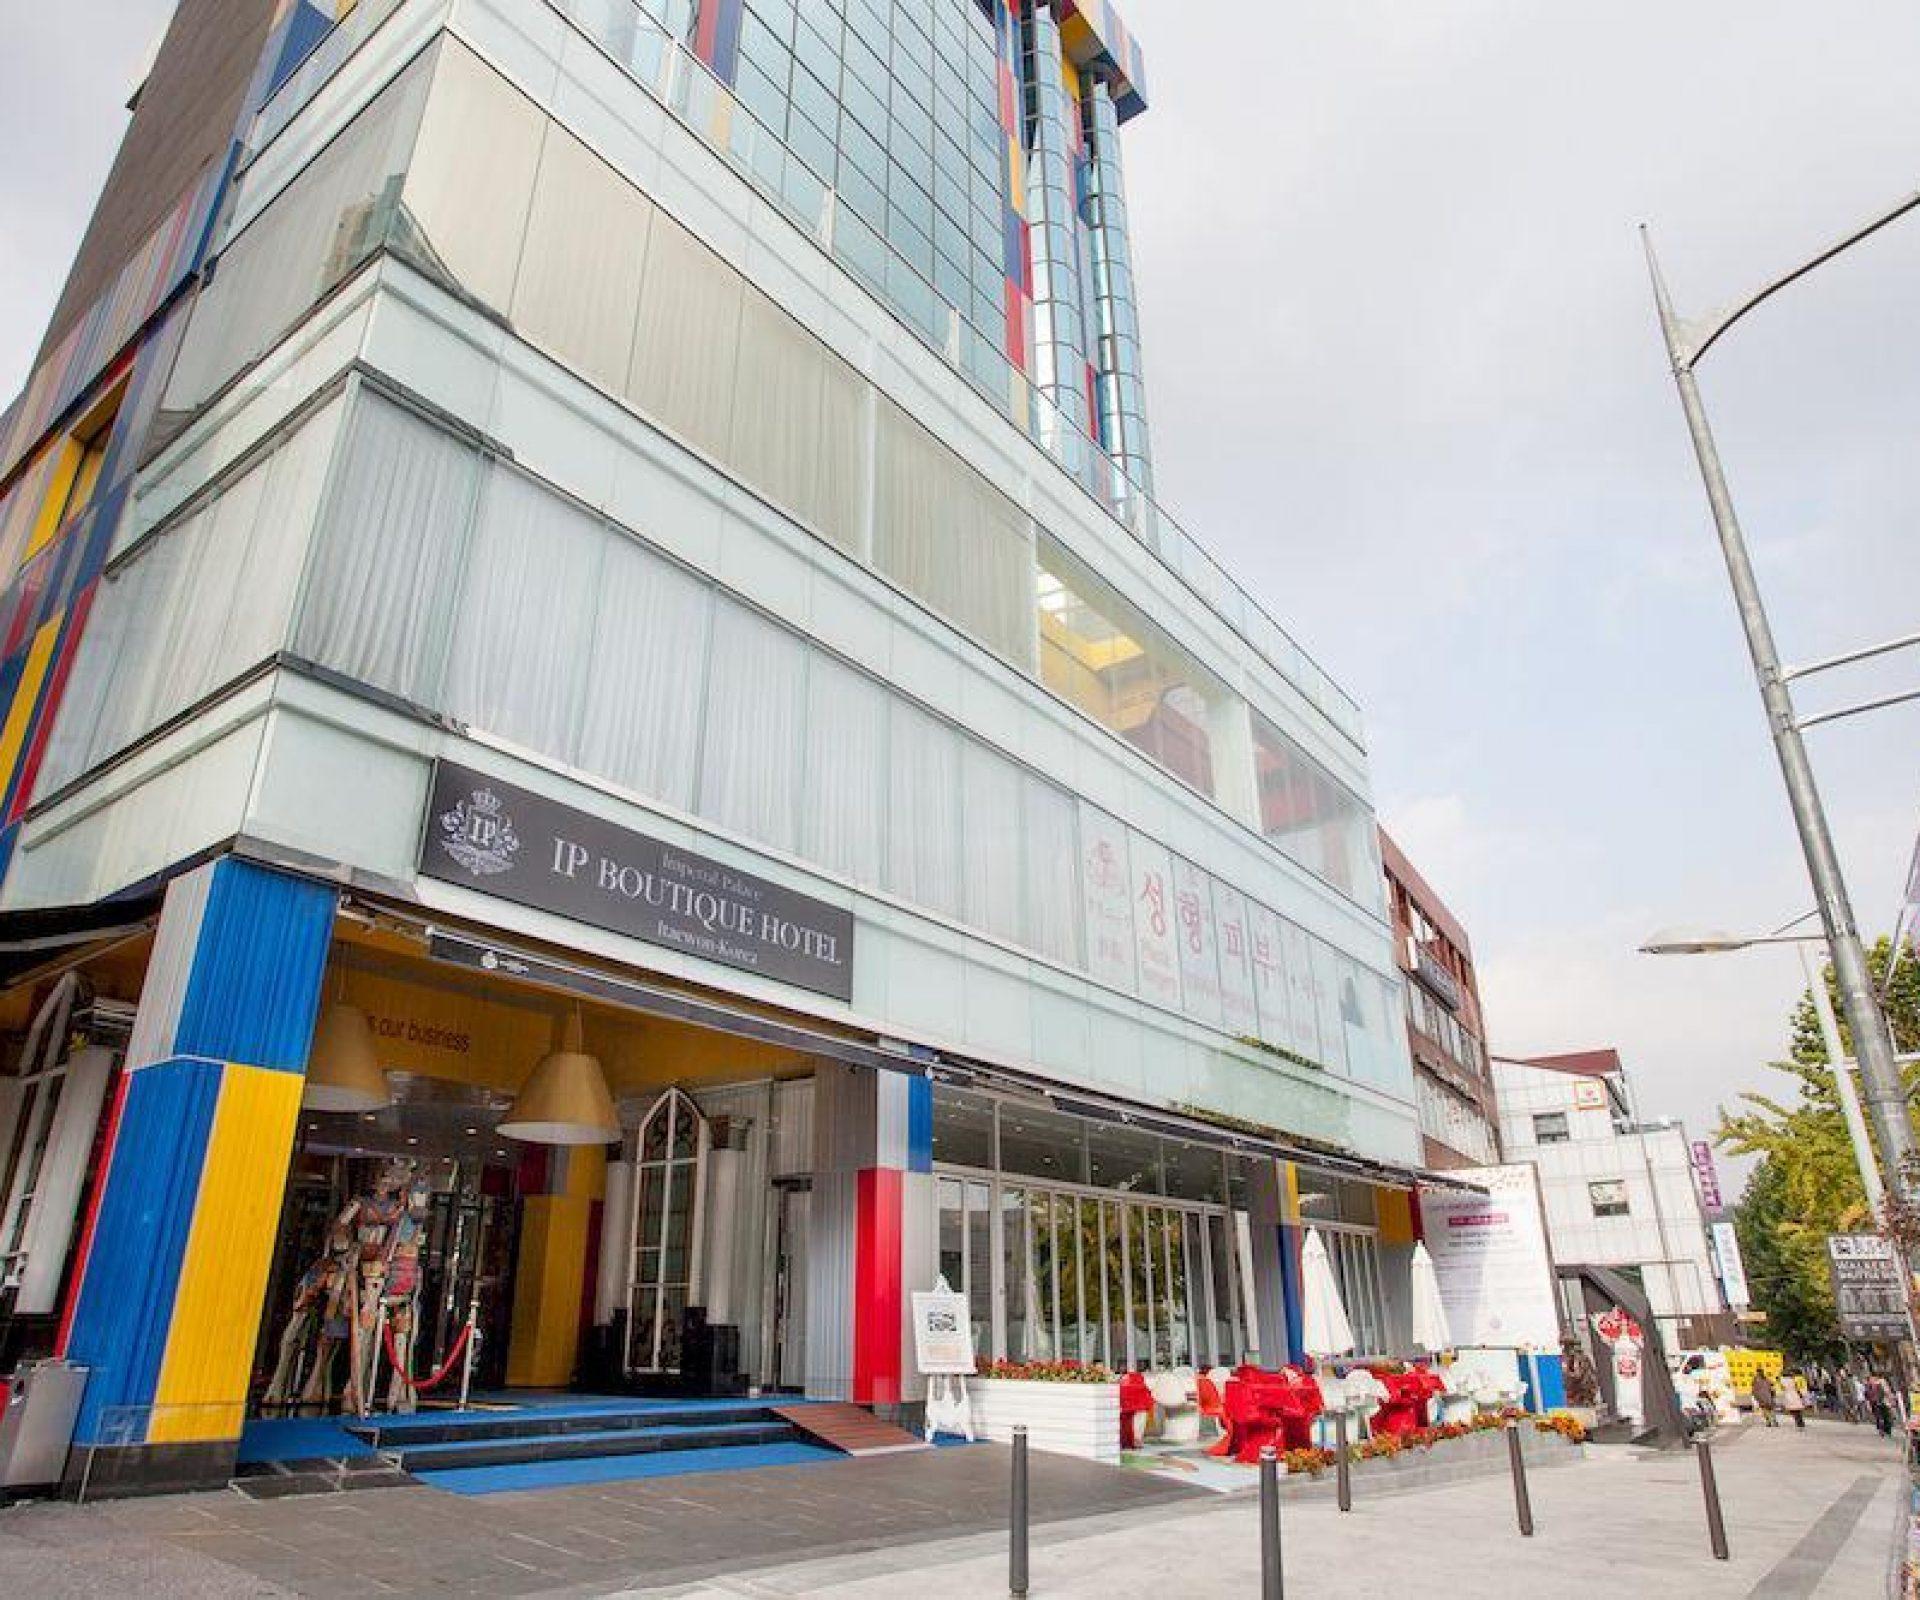 Imperial Palace Boutique Hotel | Yongsan-gu, Seoul